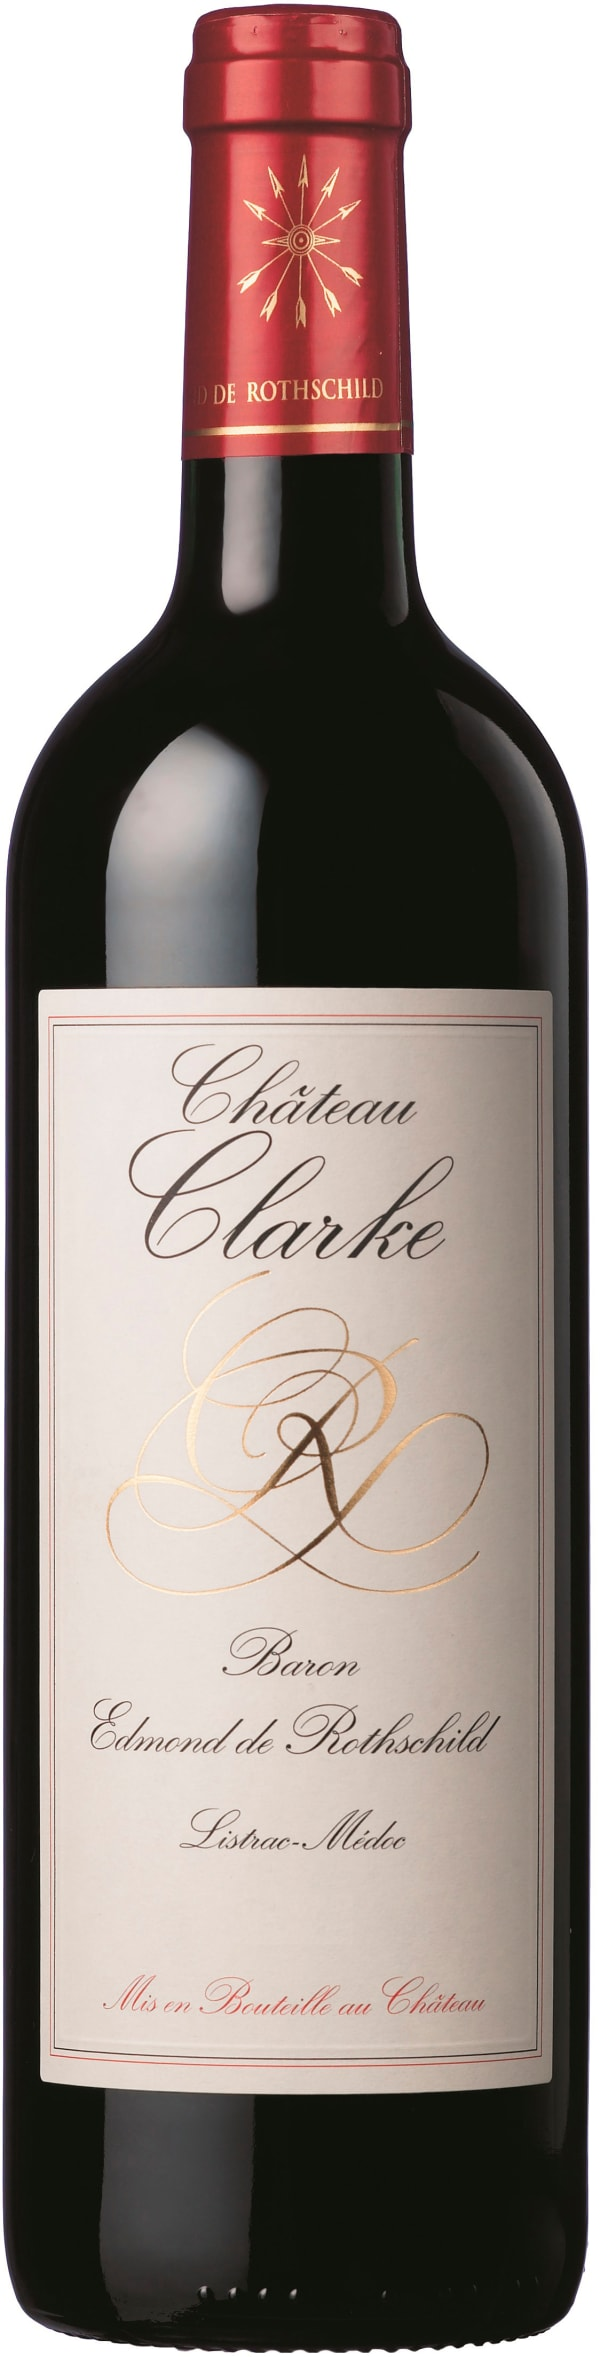 Chateau Clarke 2011